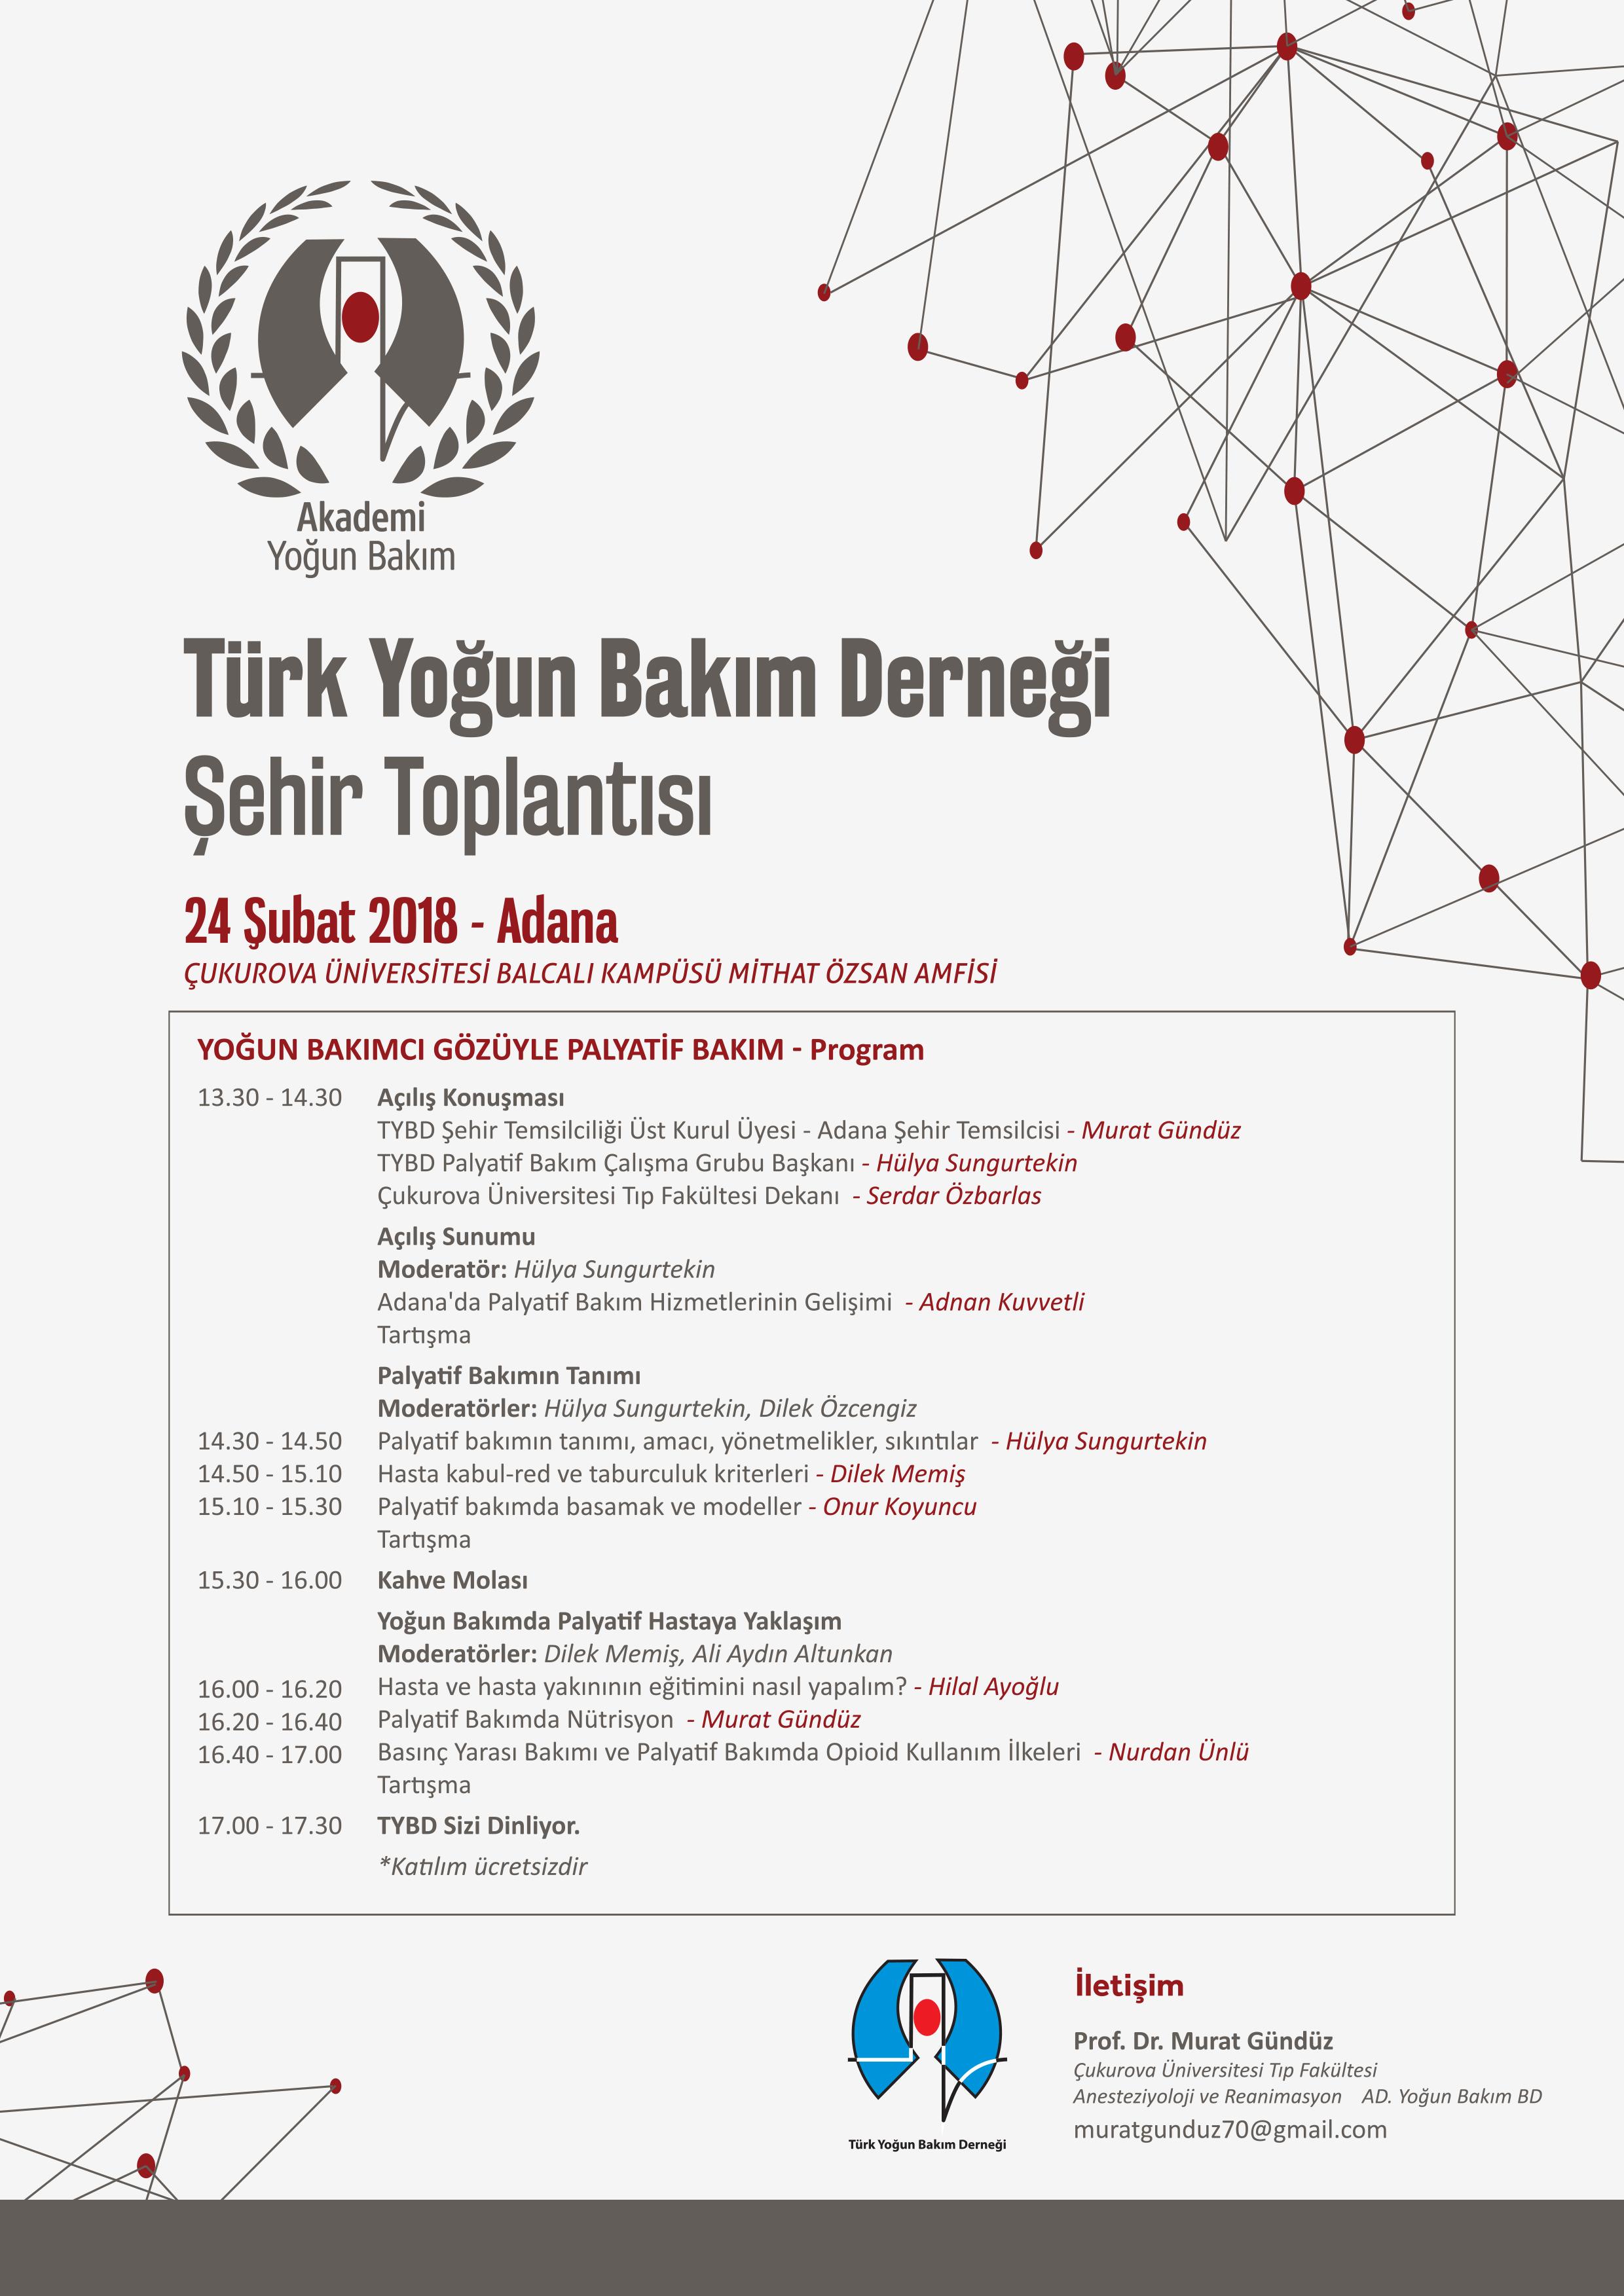 Þehir Toplantýsý Adana